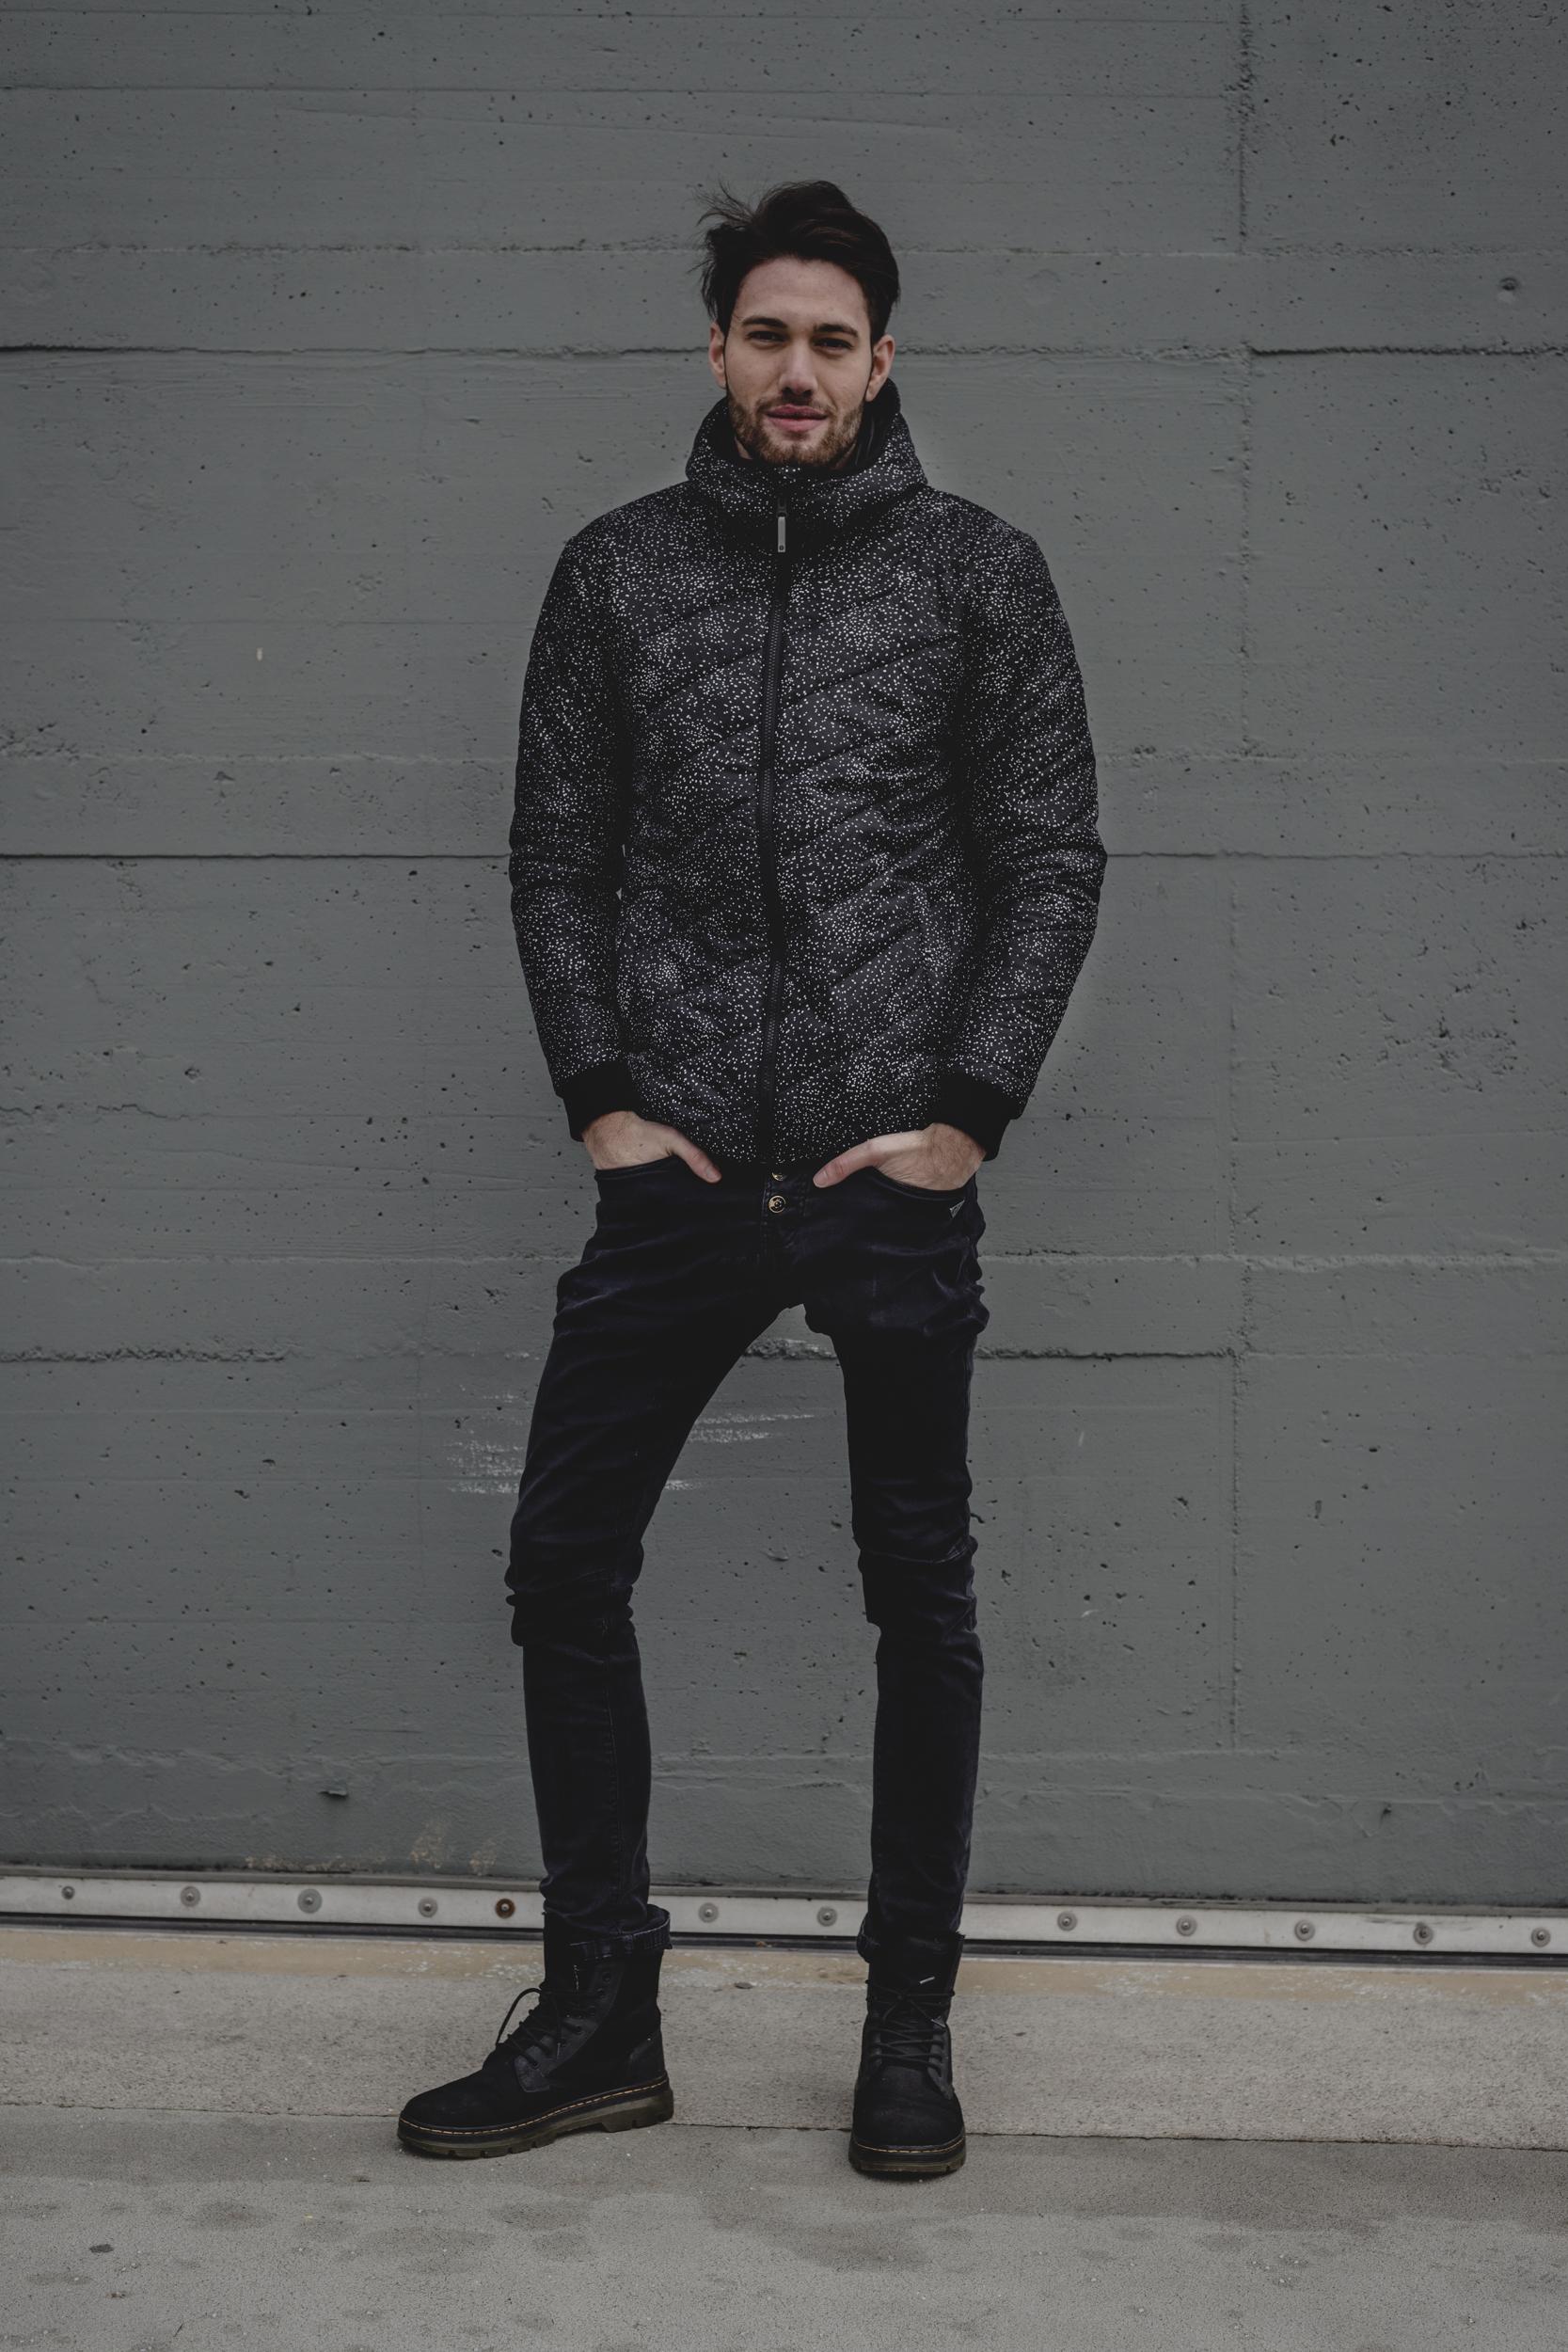 TT_fw2018_jackets_gsx5860.jpg